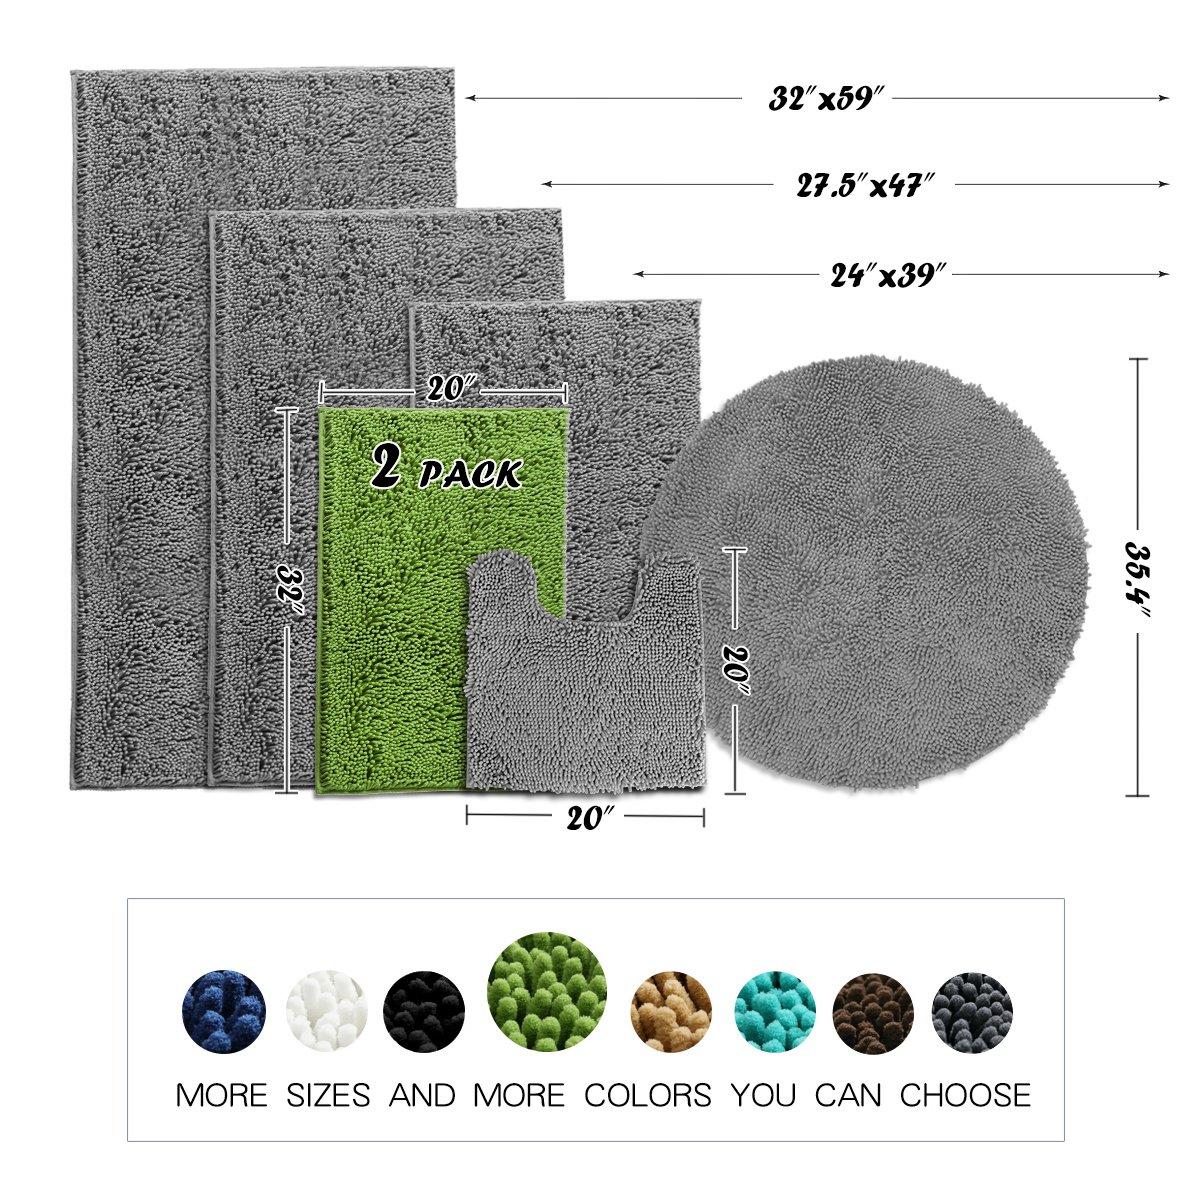 MAYSHINE Bath mats for Bathroom Rugs Non Slip Machine Washable Soft Microfiber 2 Pack 20/×32 inches, White